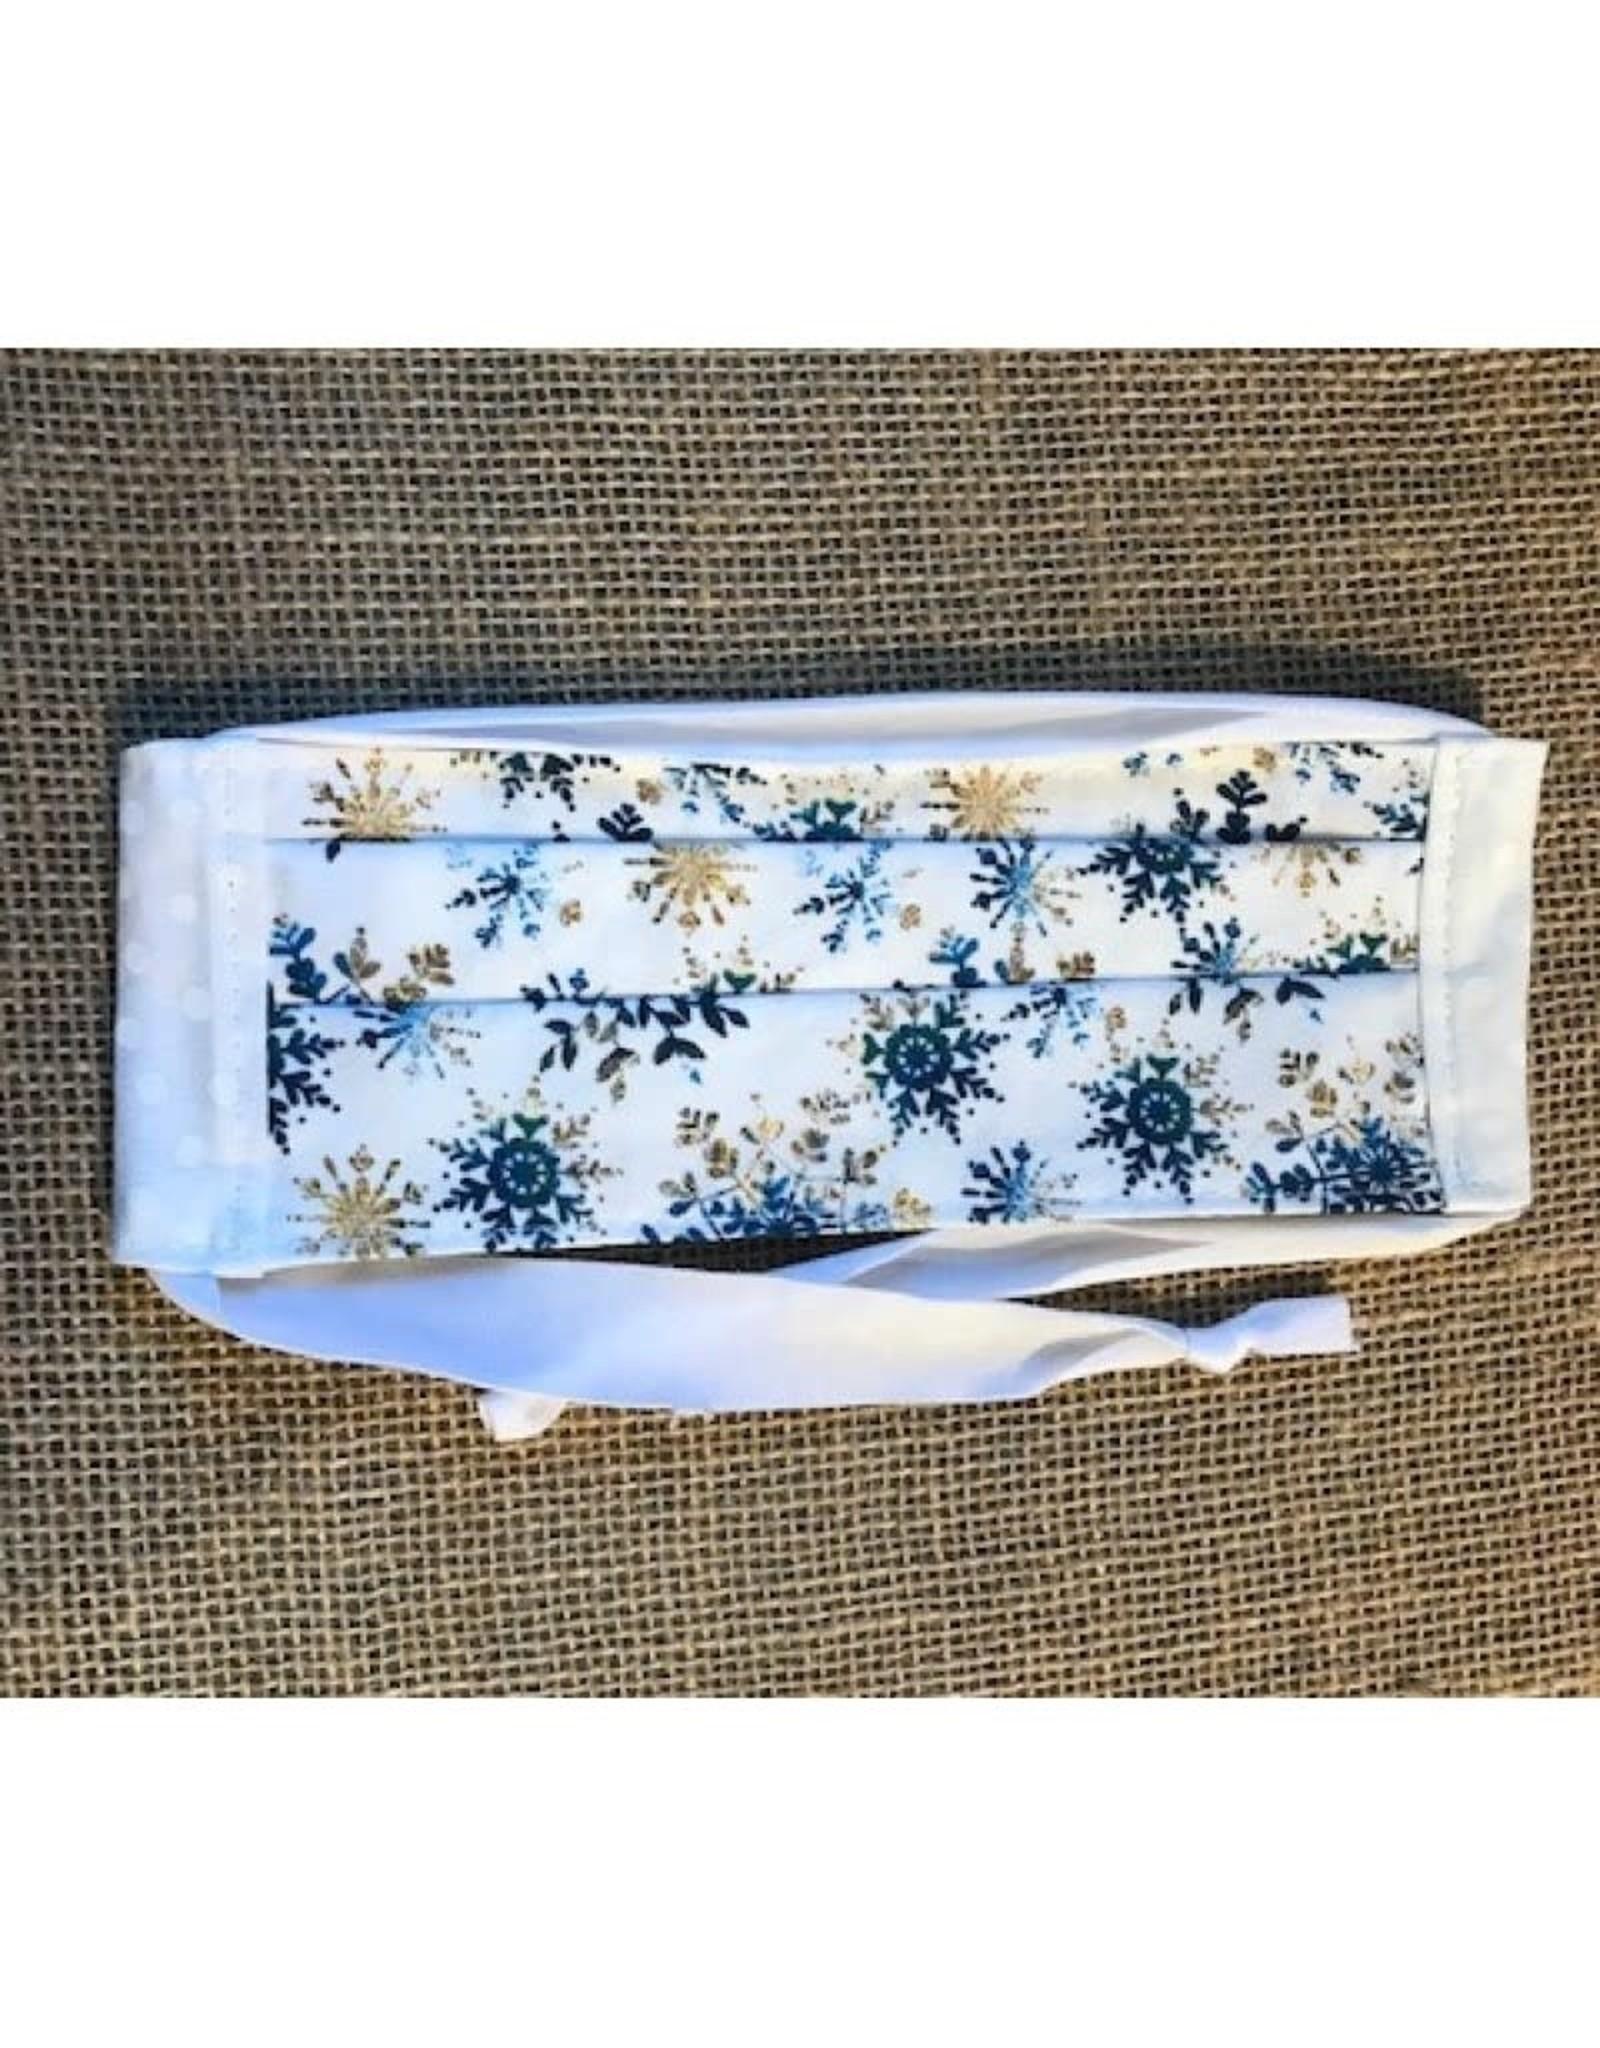 Bear Den Handmade Cotton Mask - Blue Snowflakes on White